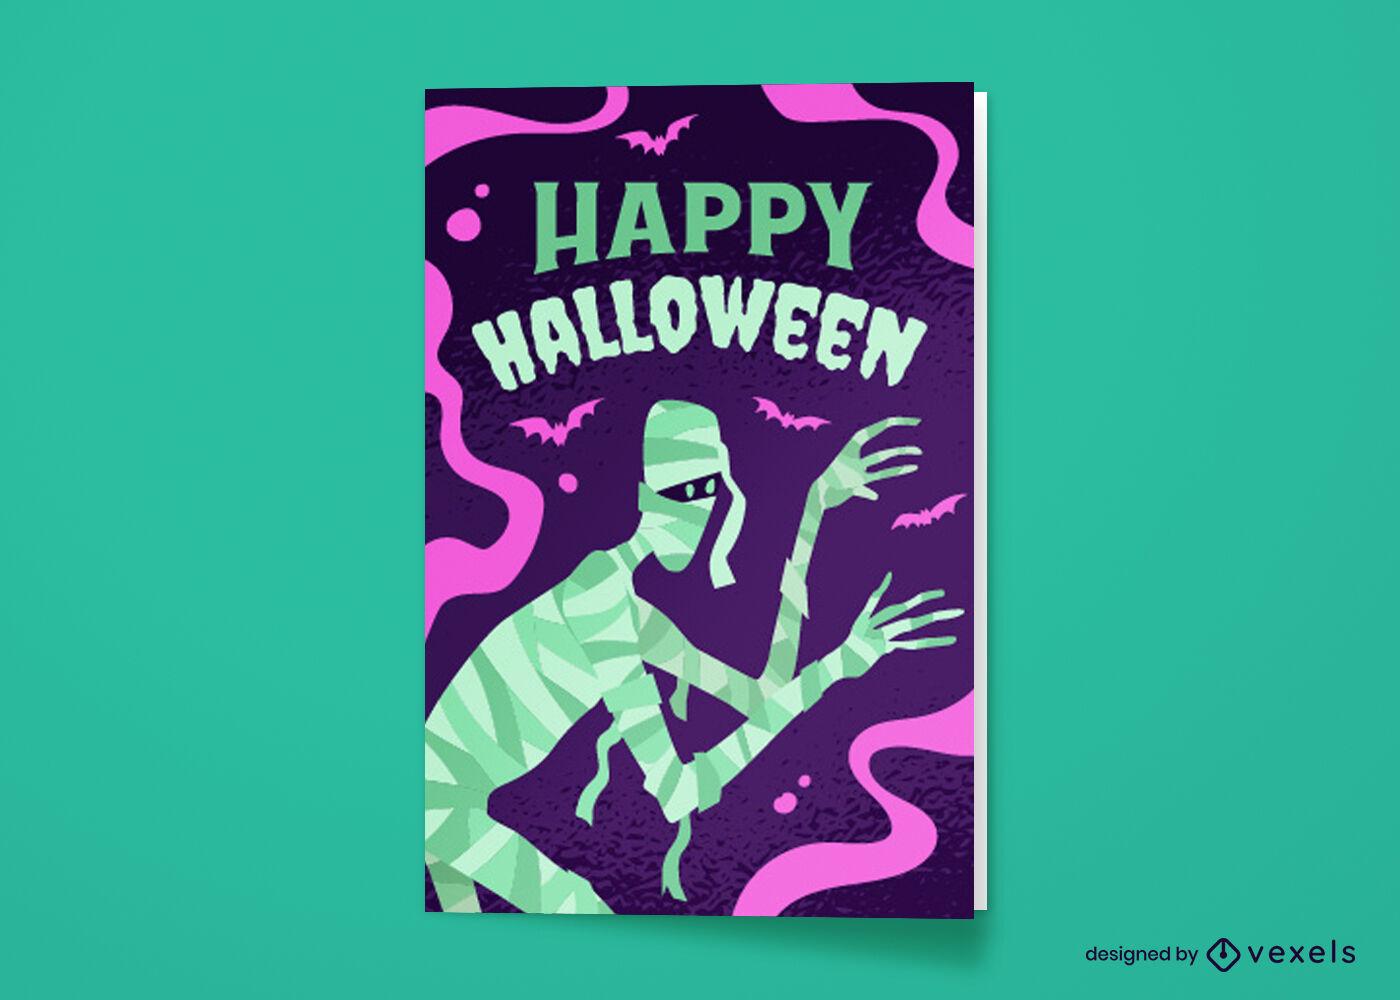 Tarjeta de felicitación de dibujos animados de momia de Halloween